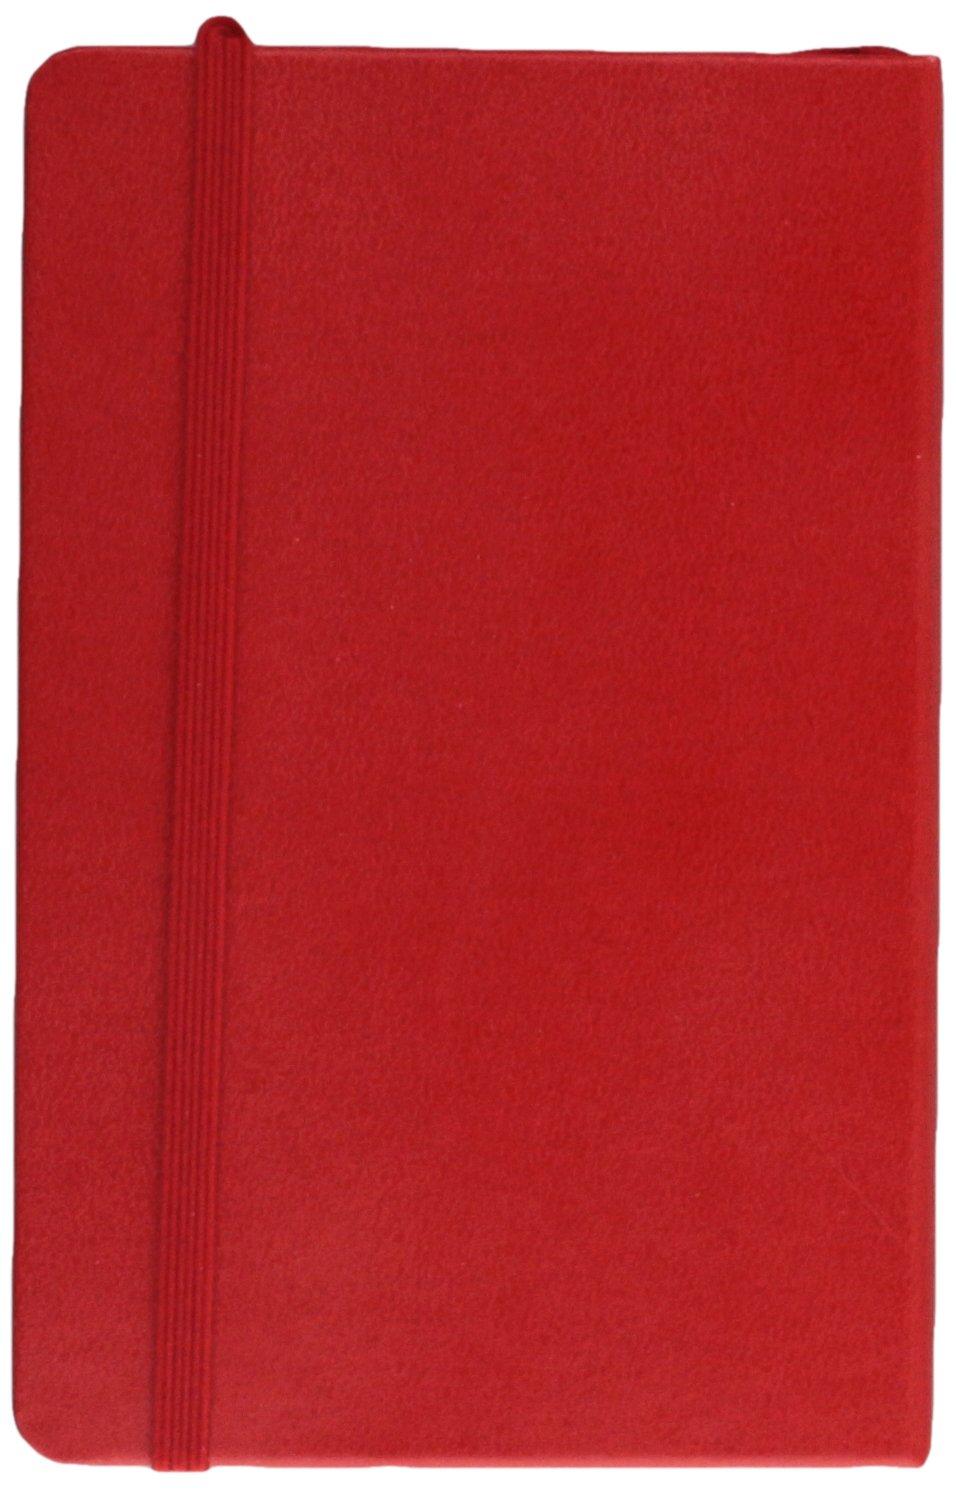 Moleskine 2017 Weekly Notebook, 12M, Pocket, Scarlet Red, Hard Cover (3.5 x 5.5)